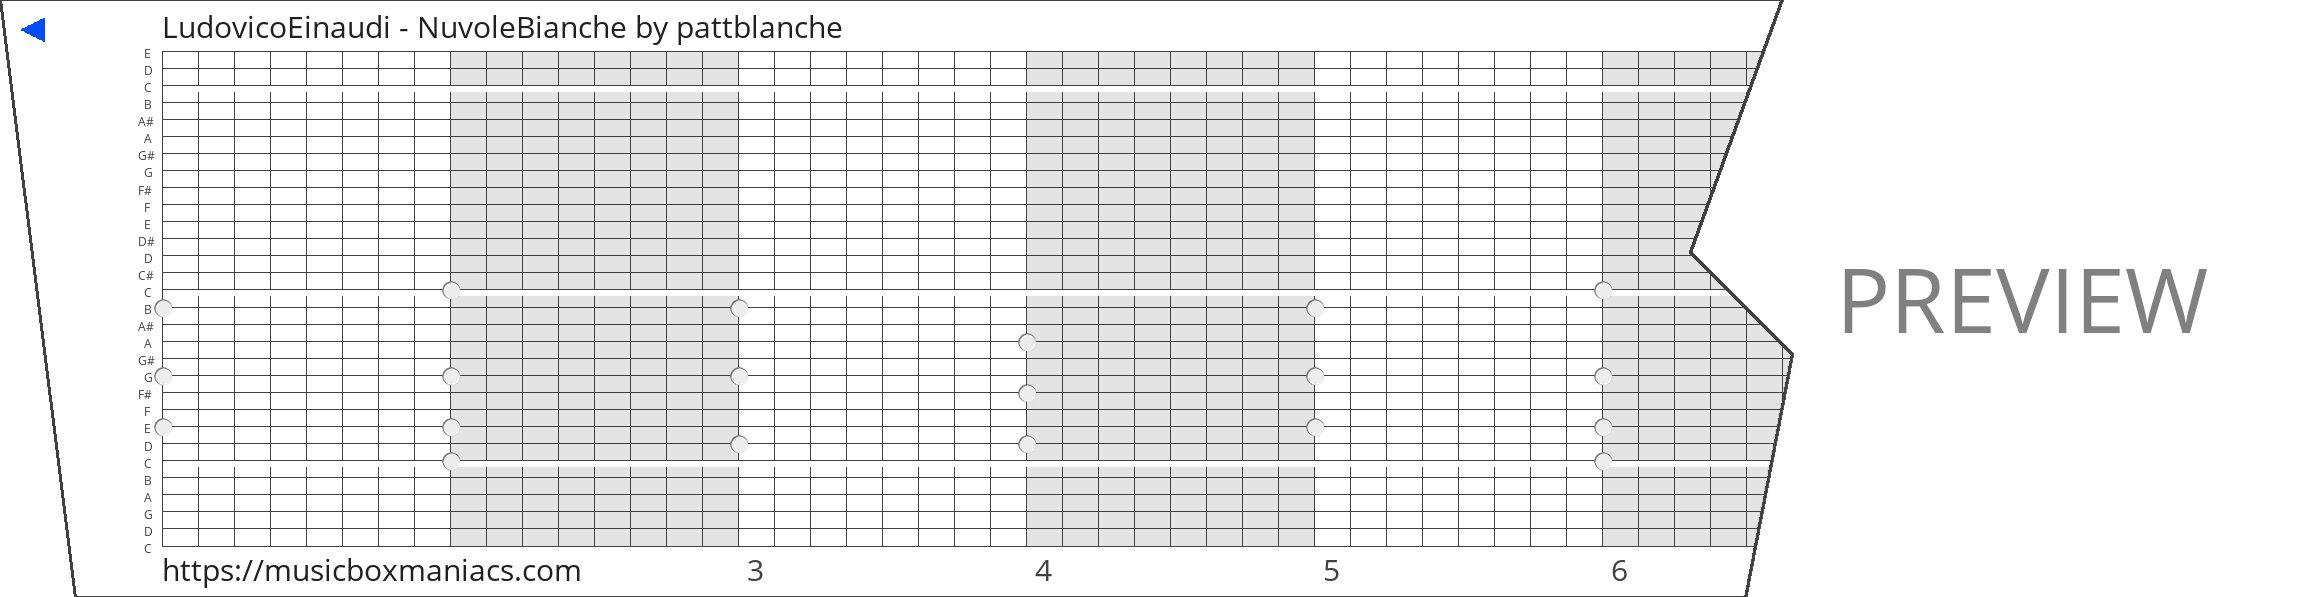 LudovicoEinaudi - NuvoleBianche 30 note music box paper strip